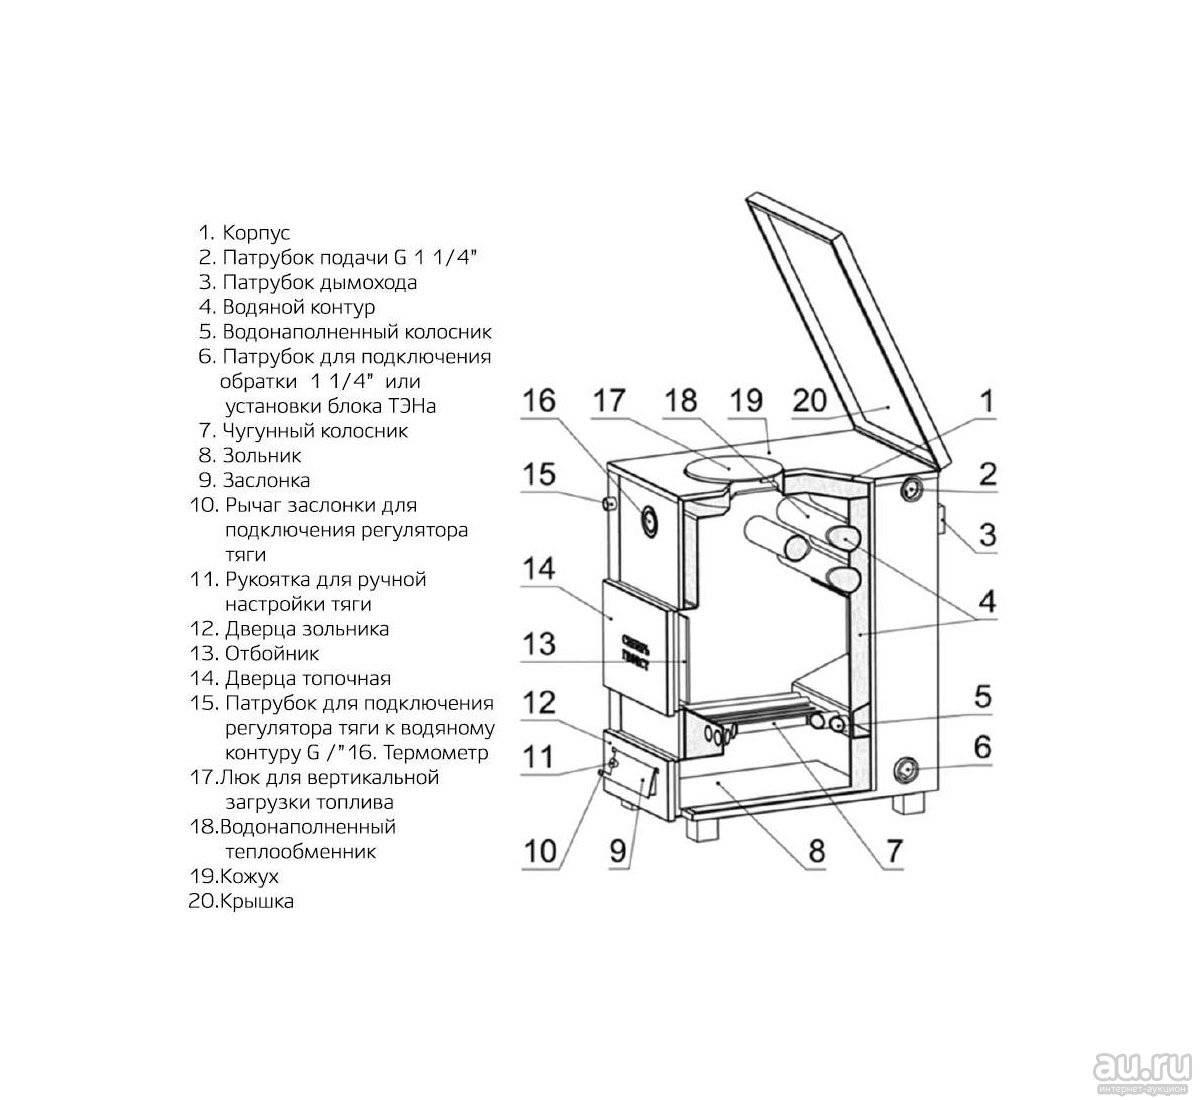 Газовый котел сиберия (siberia): технические характеристики, подключение, устройство